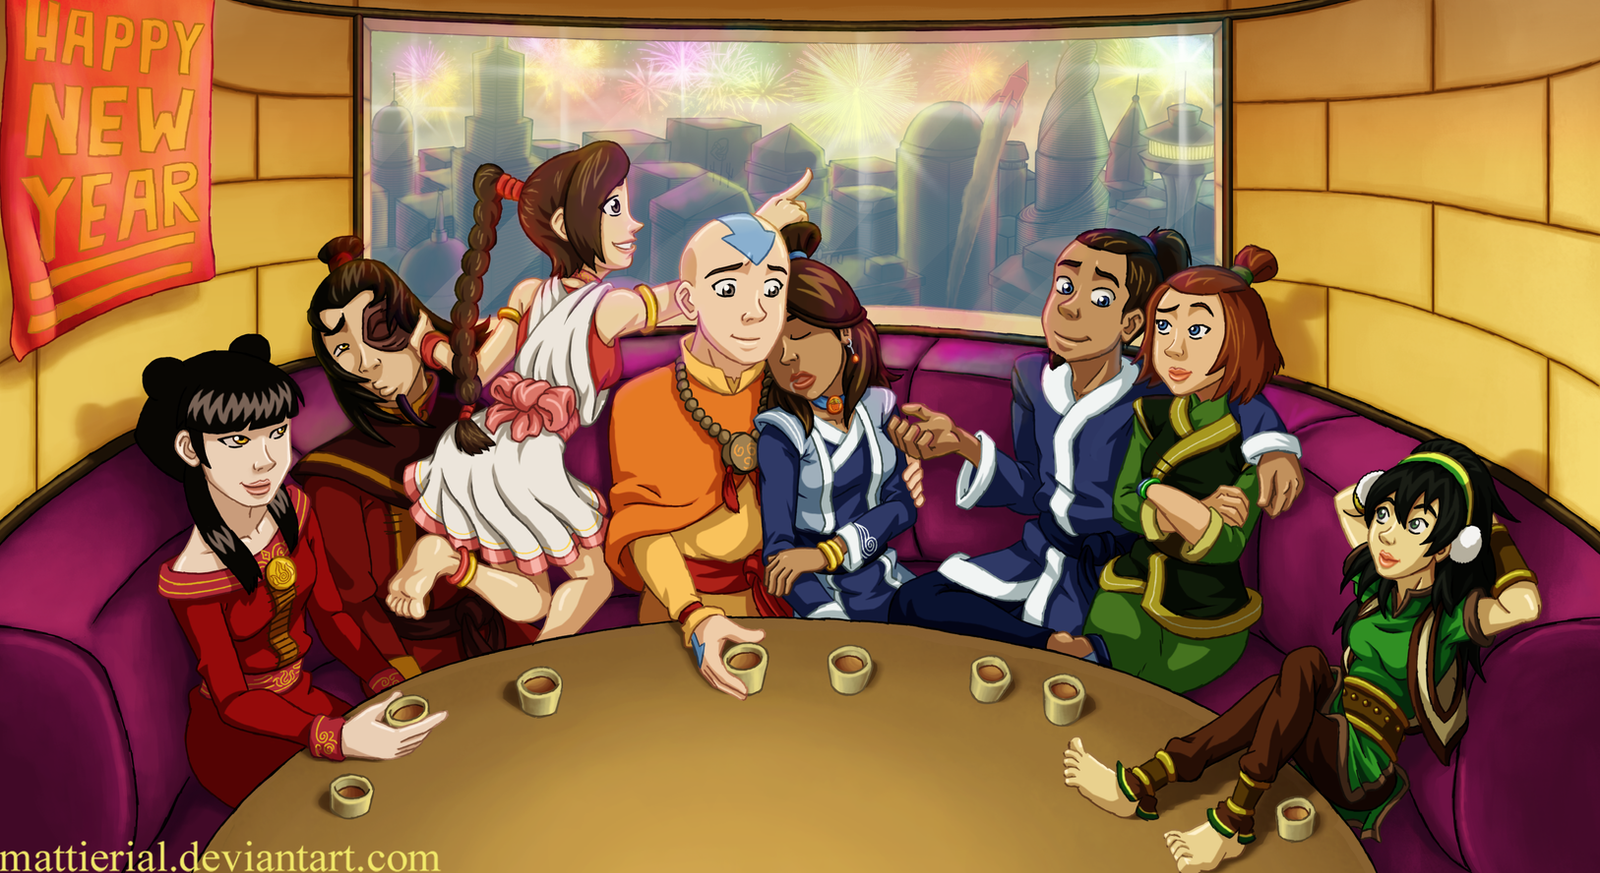 Avatar: HAPPY NEW YEAR by Mattierial